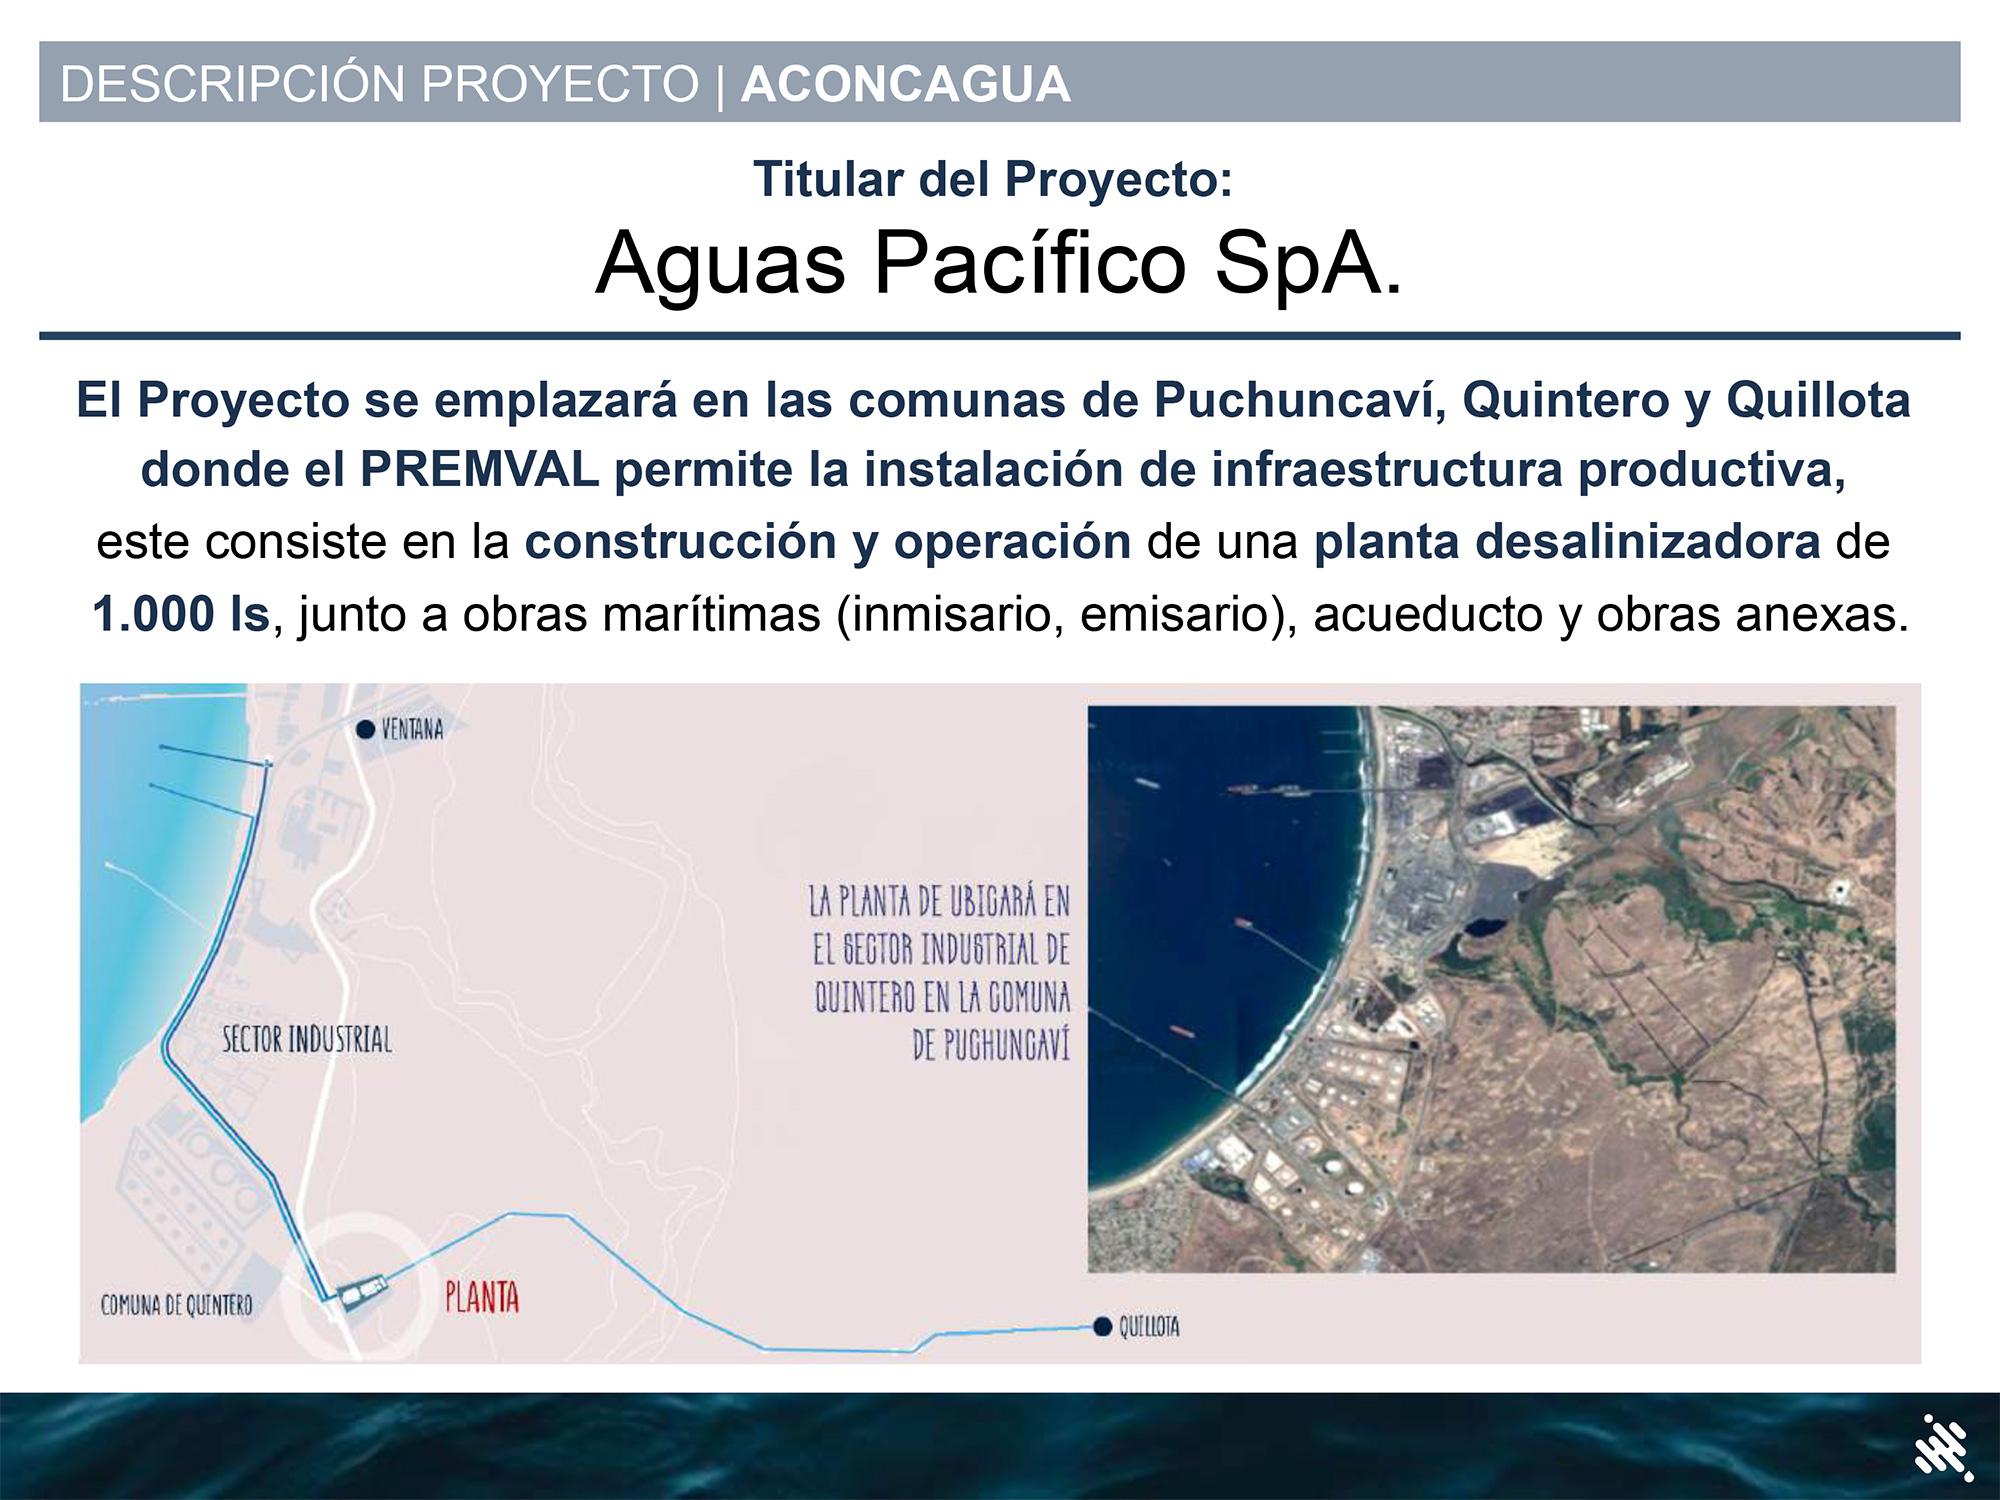 AP_Proyecto_Aconcagua-3.jpg